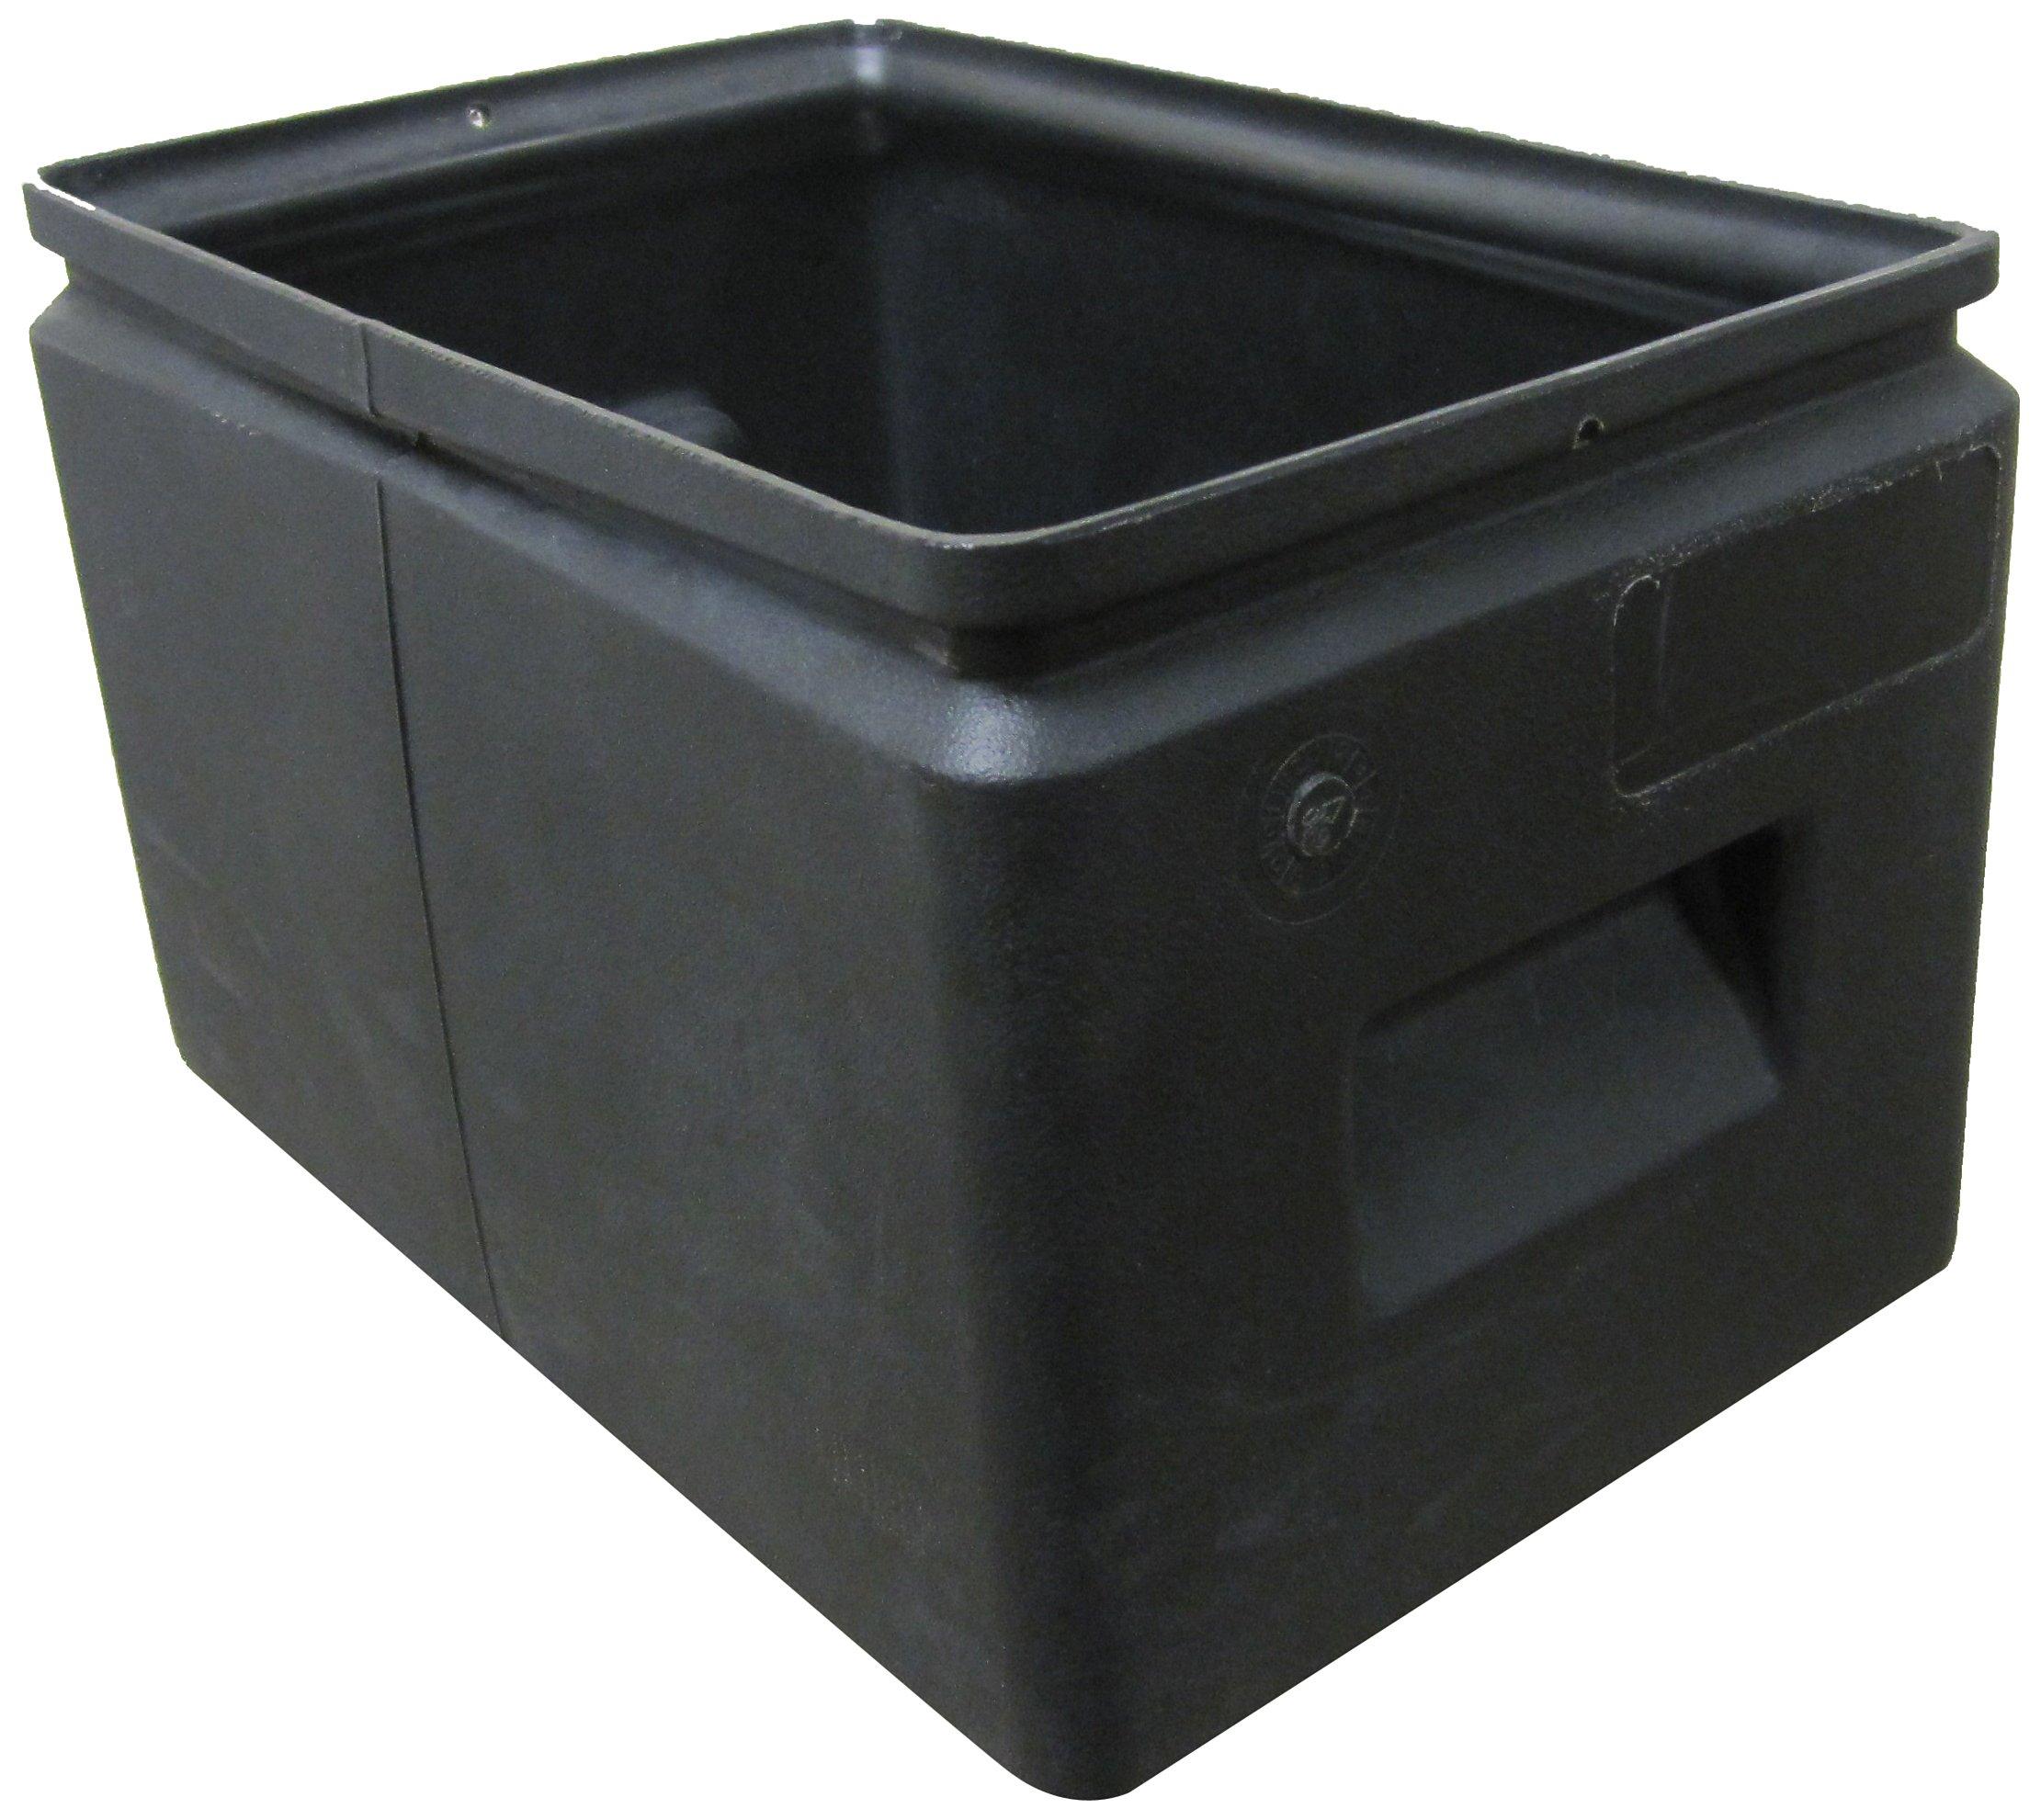 Forte Products 8001257 All Purpose Plastic Storage Bin, 14.5'' L x 9.5'' W x 9'' H, Black (Case of 12)